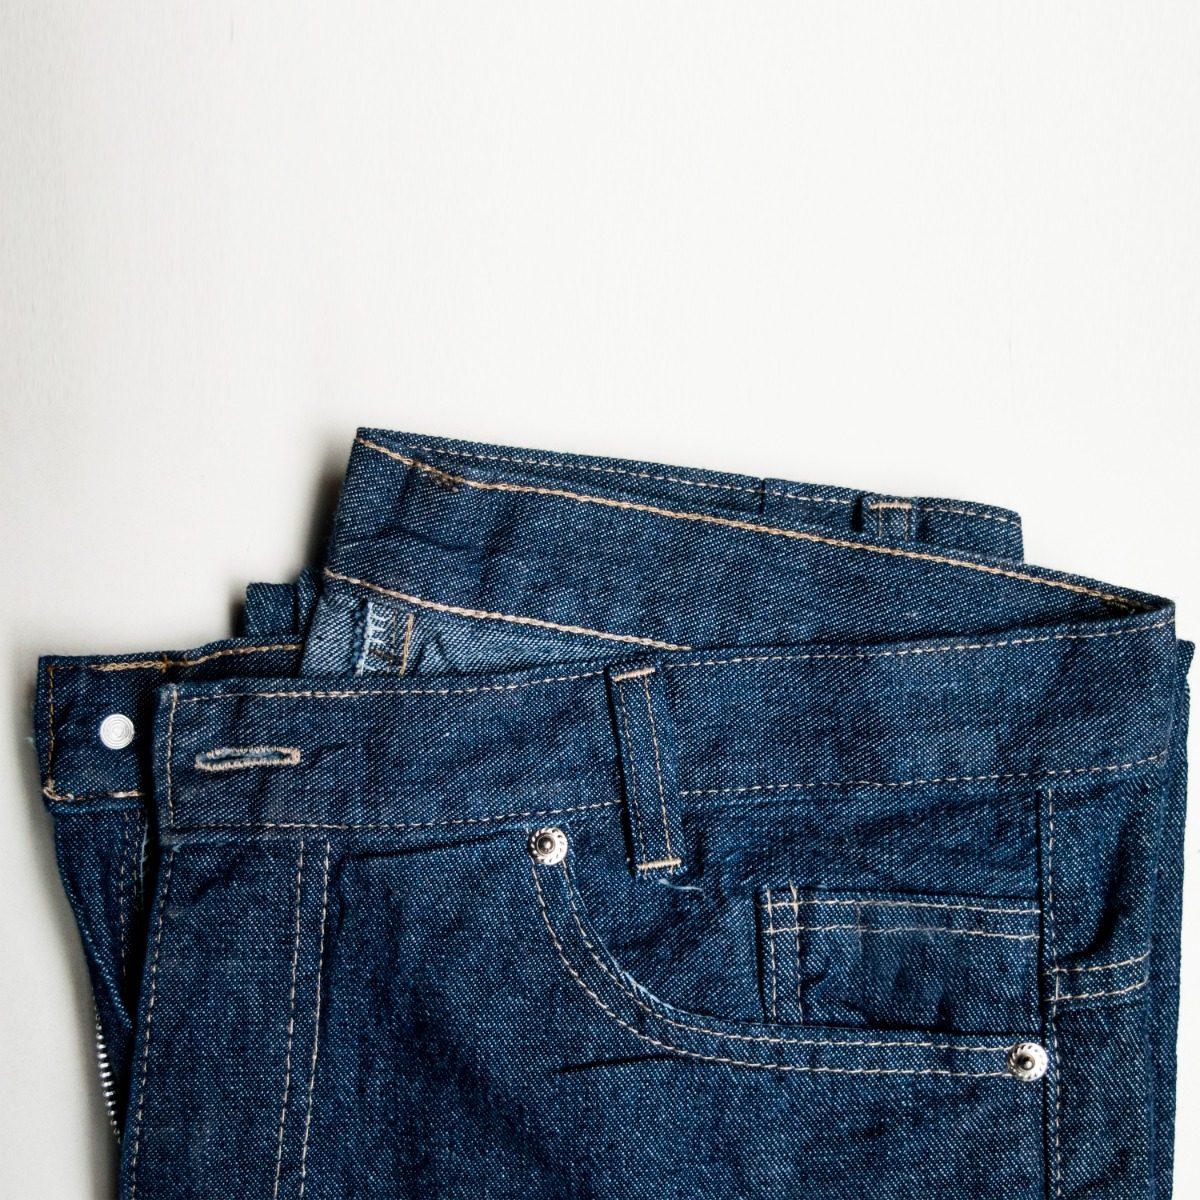 9d4238c0f calça jeans masculina tradicional amaciada uniforme barato. Carregando zoom.